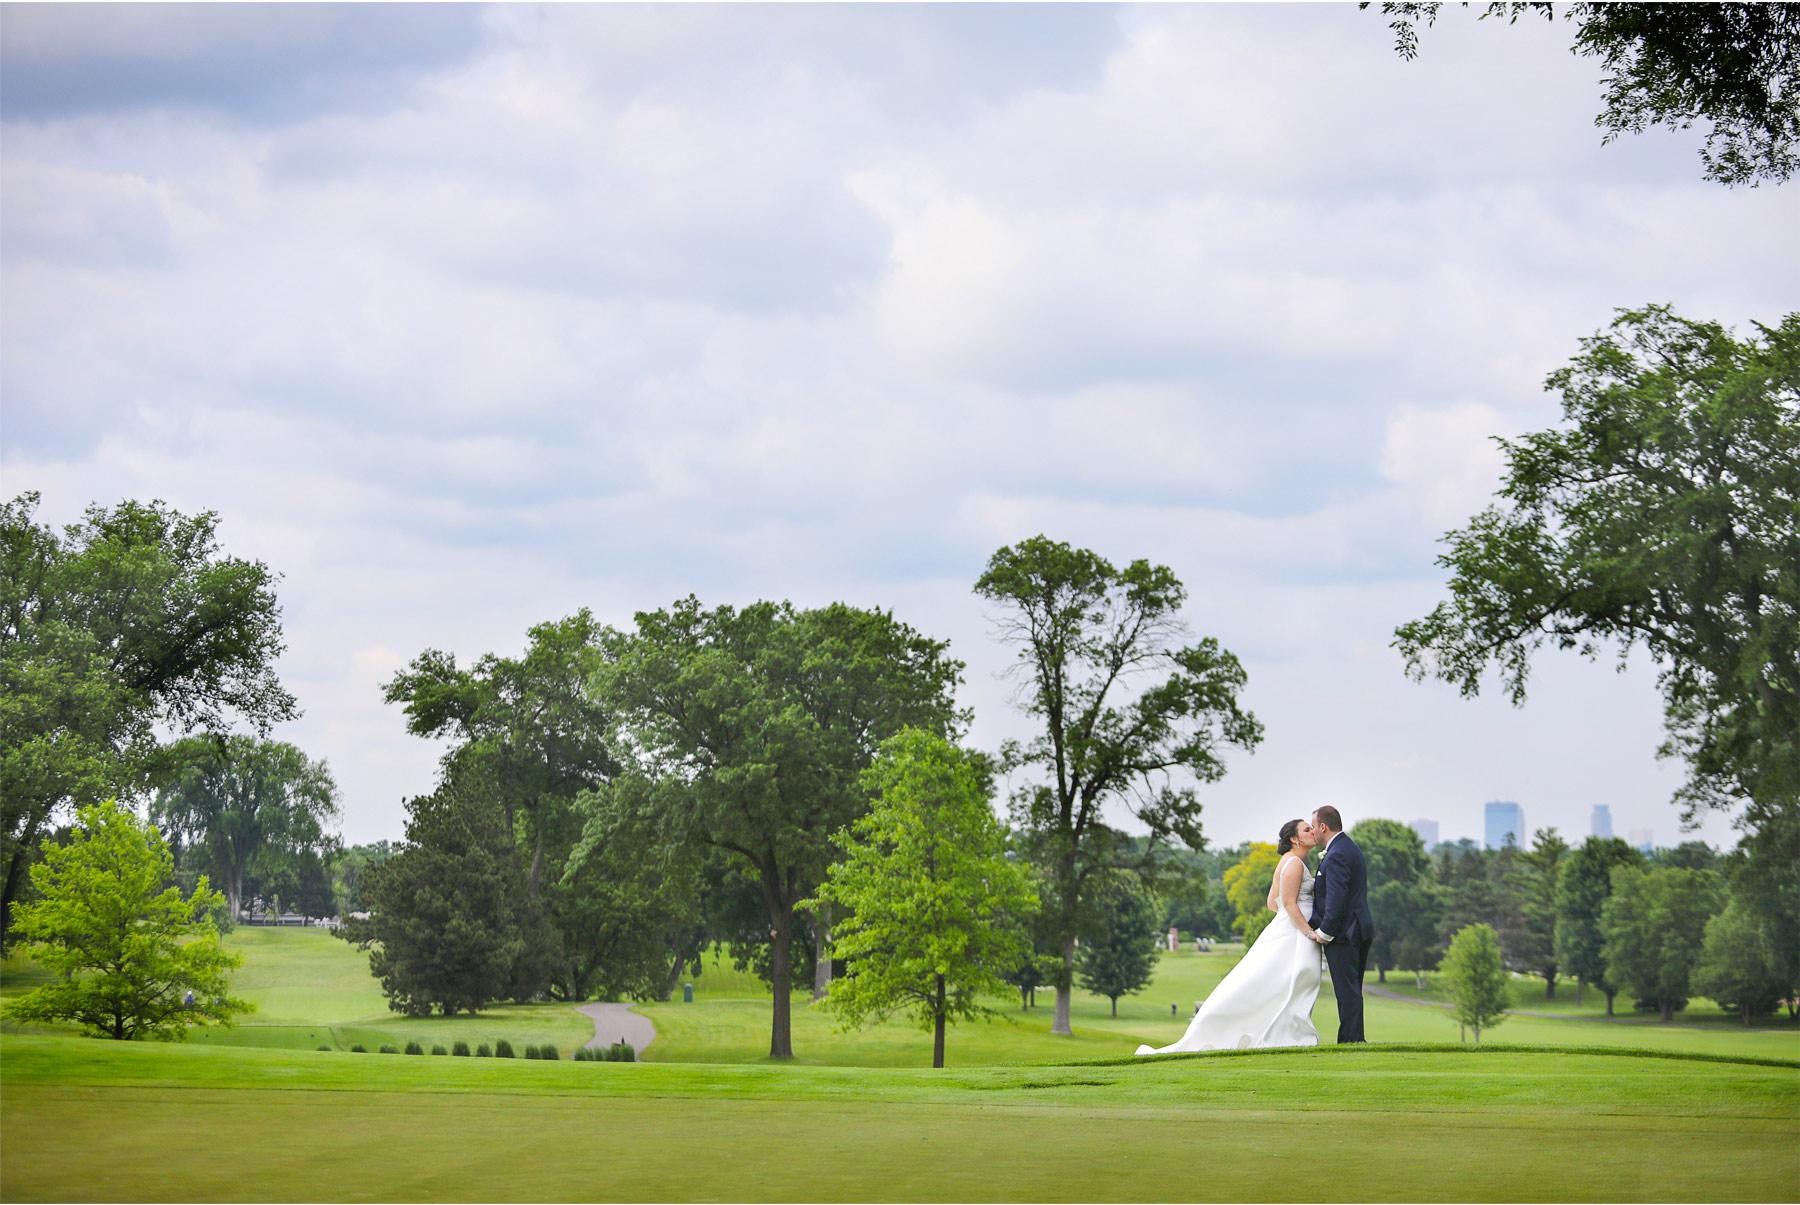 20-Vick-Photography-Wedding-Minneapolis-Minnesota-Edina-Country-Club-Reception-Bride-Groom-Erin-and-David.jpg